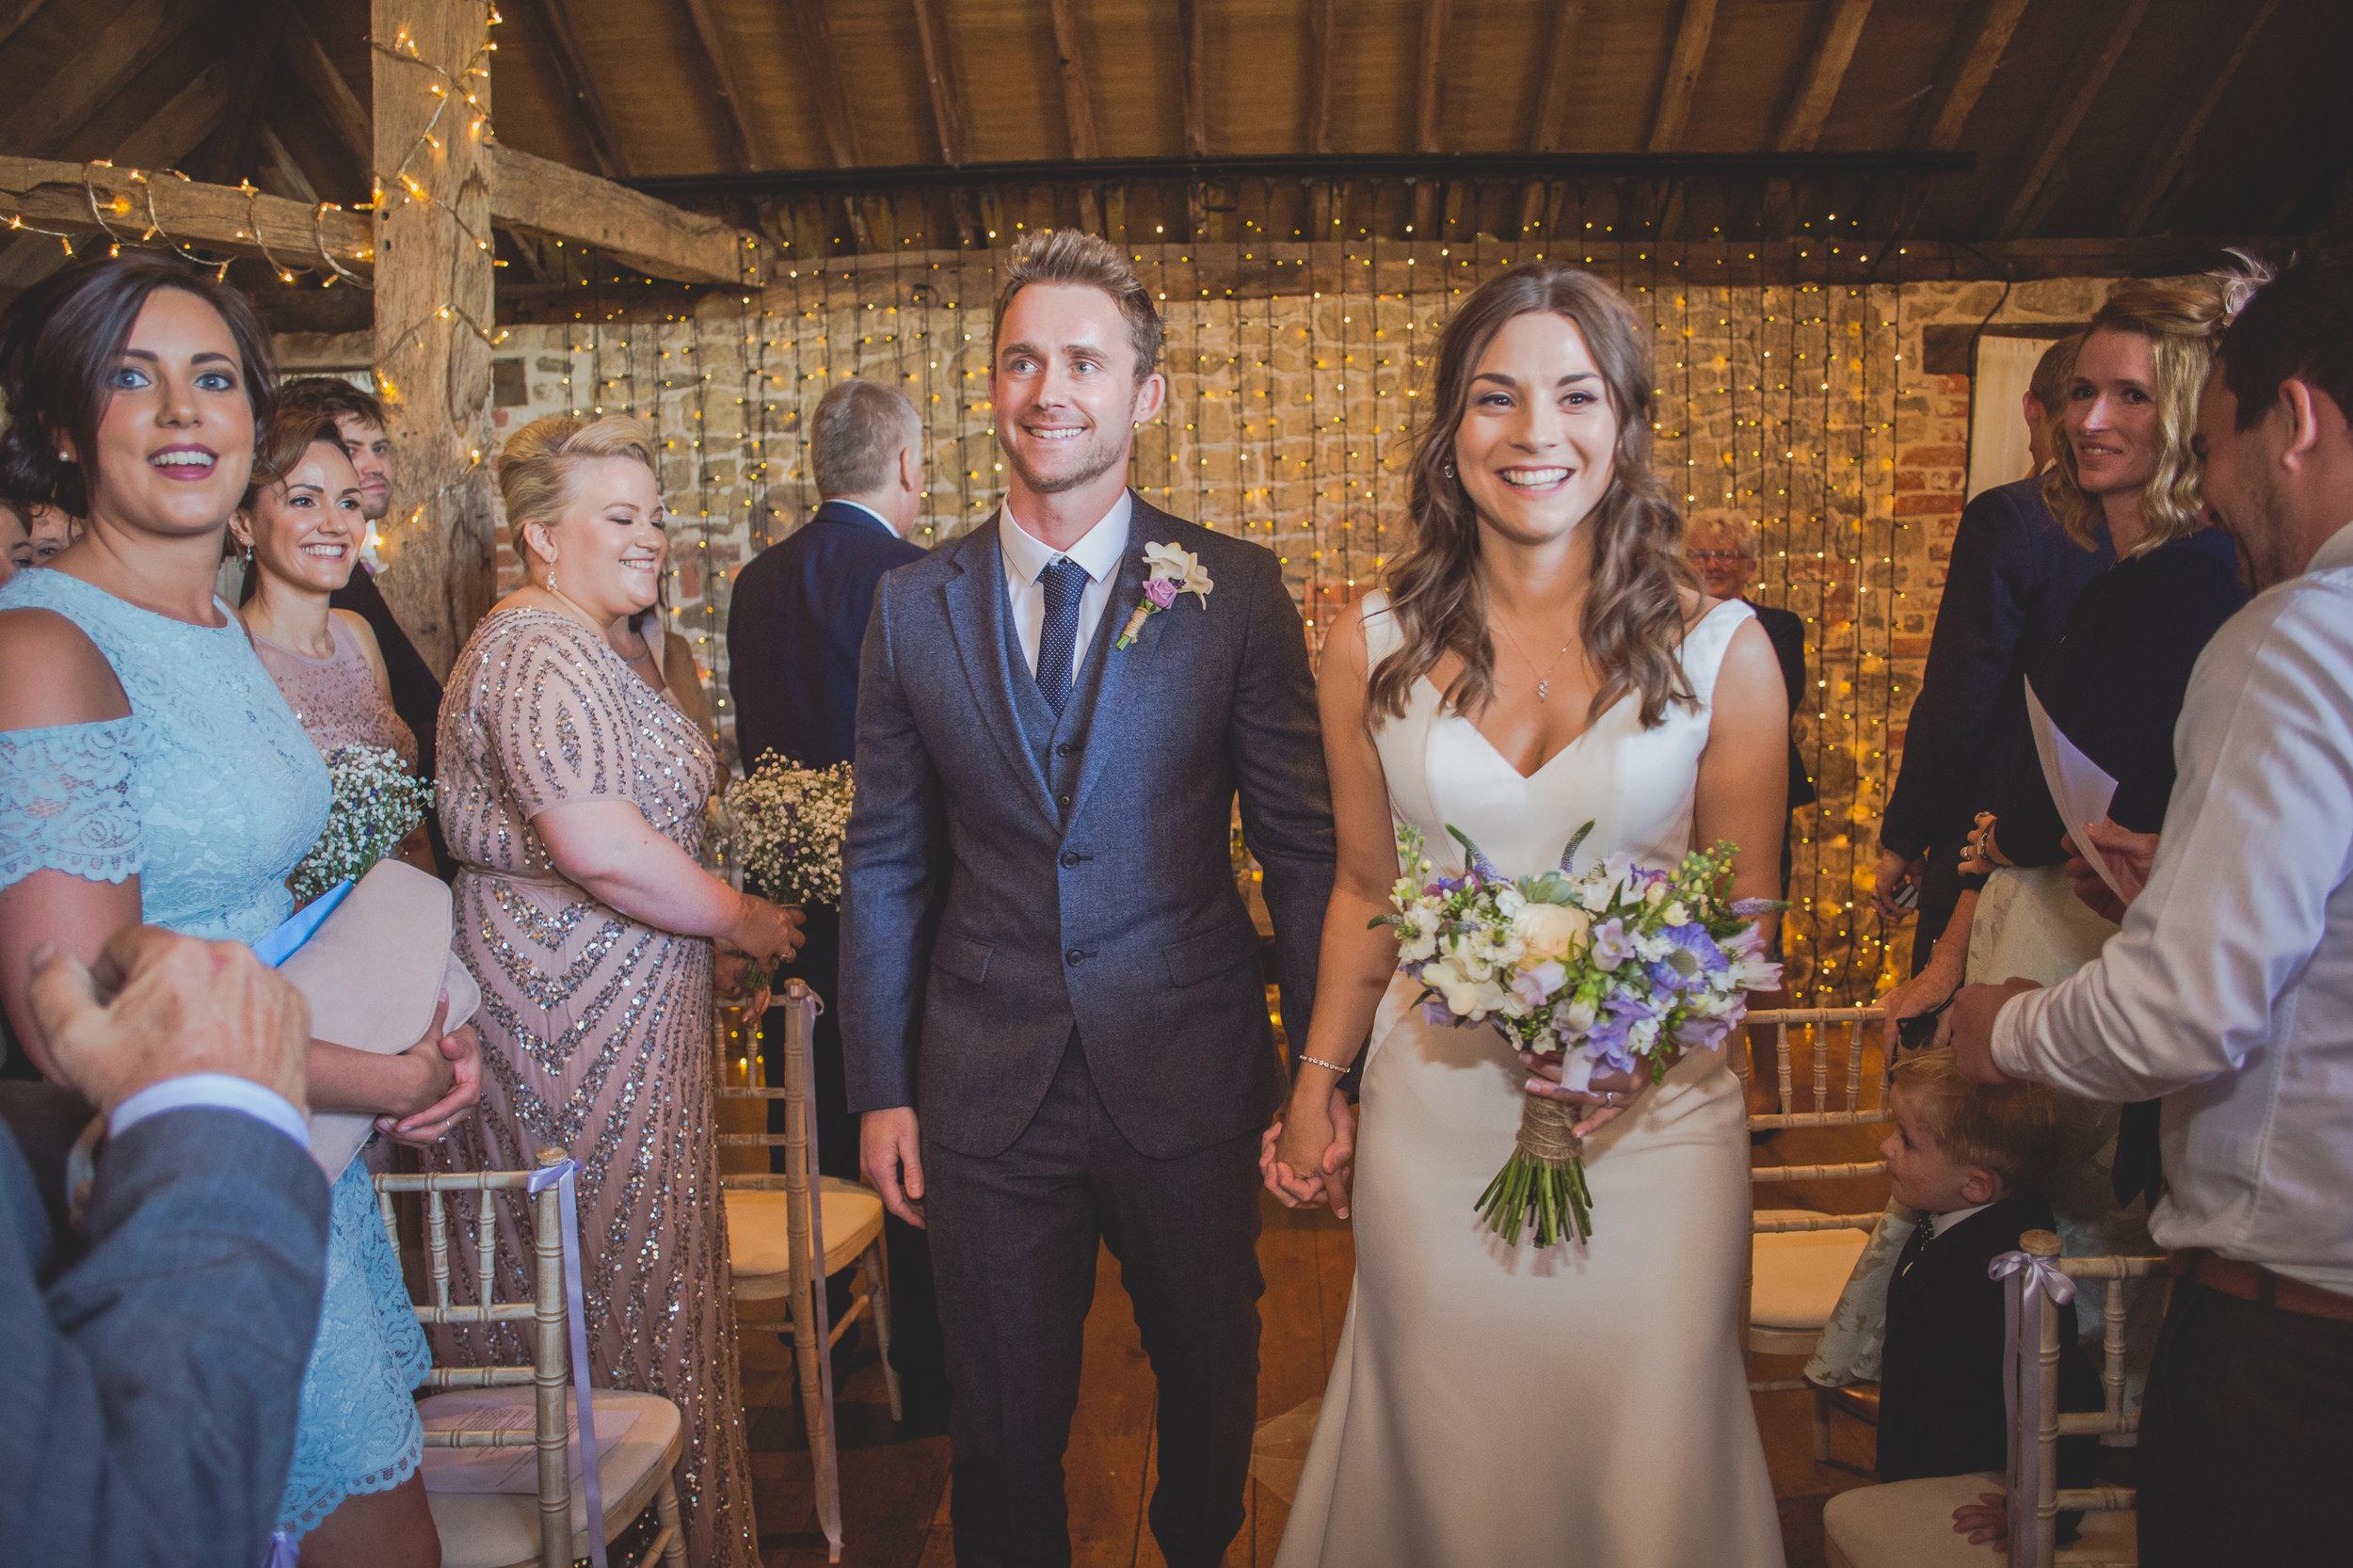 Grittenham Barn female wedding photographers west sussex petworth social-70.jpg